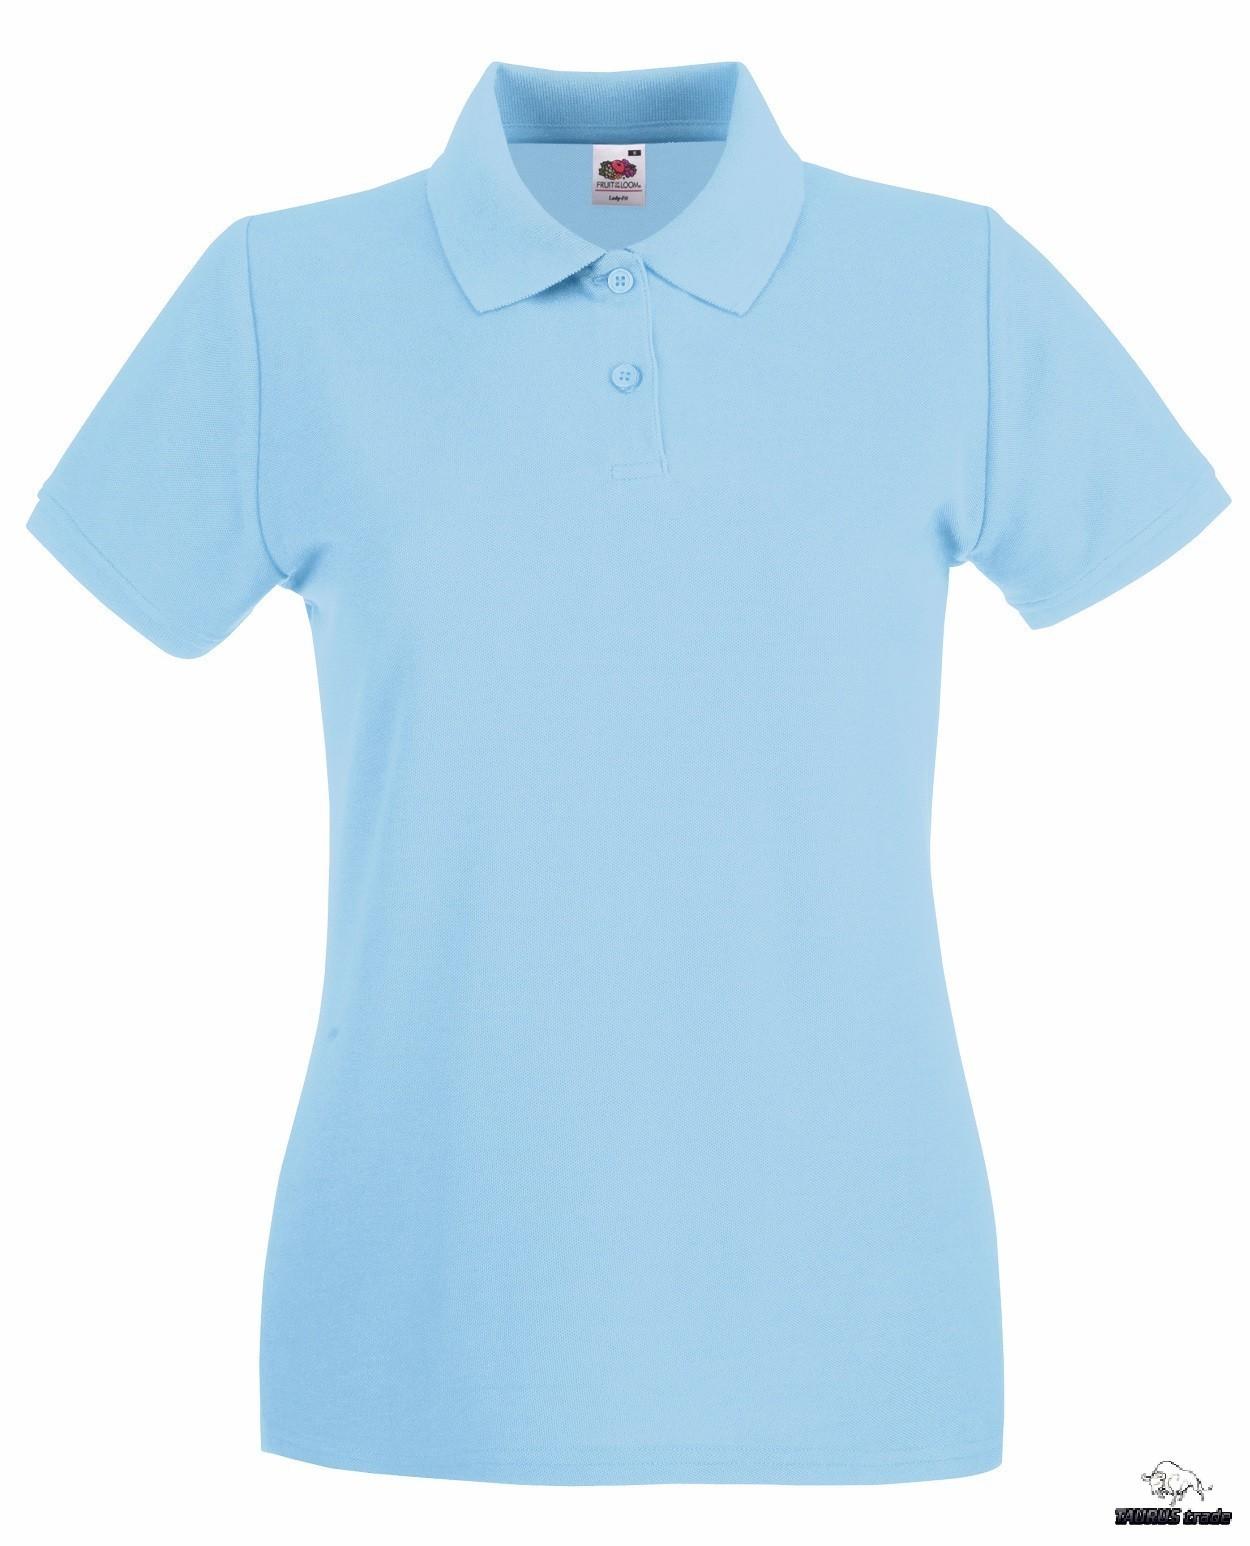 63-030-sky blue